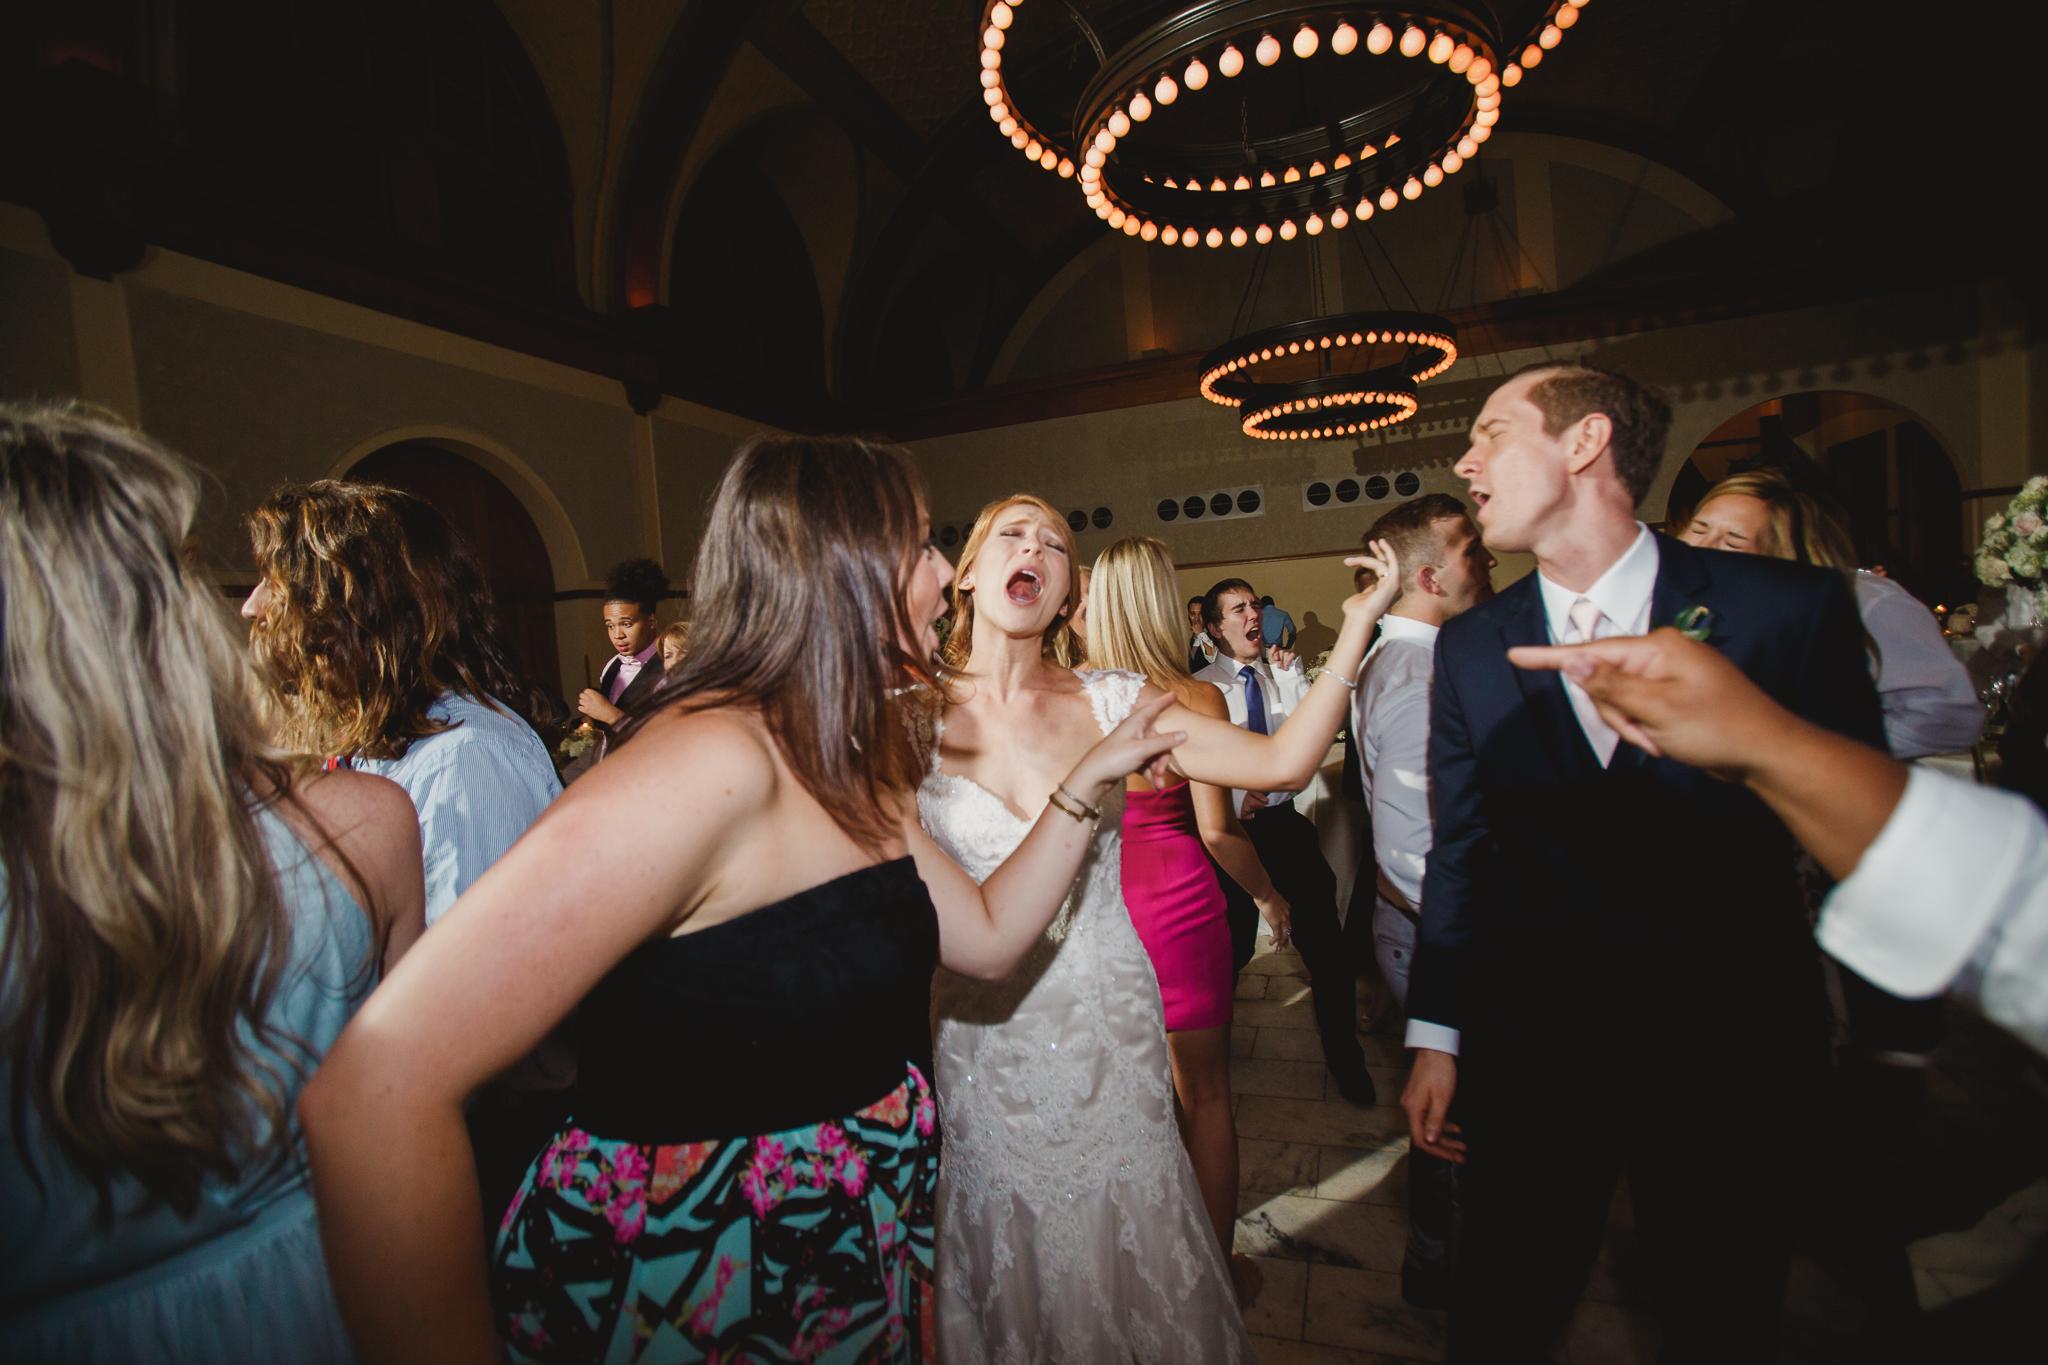 Michael and Kelly - the ashton depot - wedding DFW - wedding photographer- elizalde photography (126 of 150).jpg